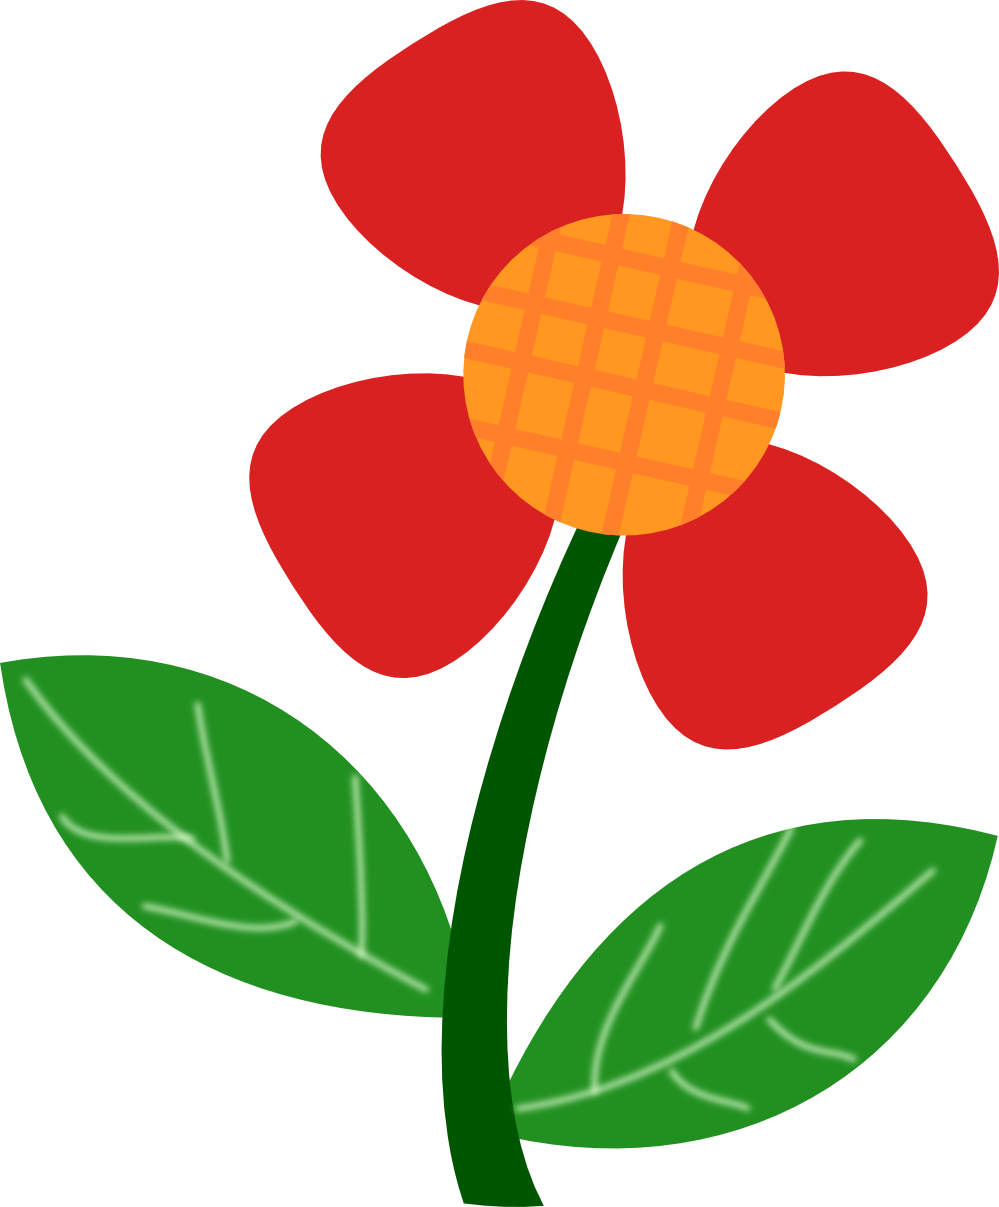 Flower Clip Art 2018- Z31 Coloring Page